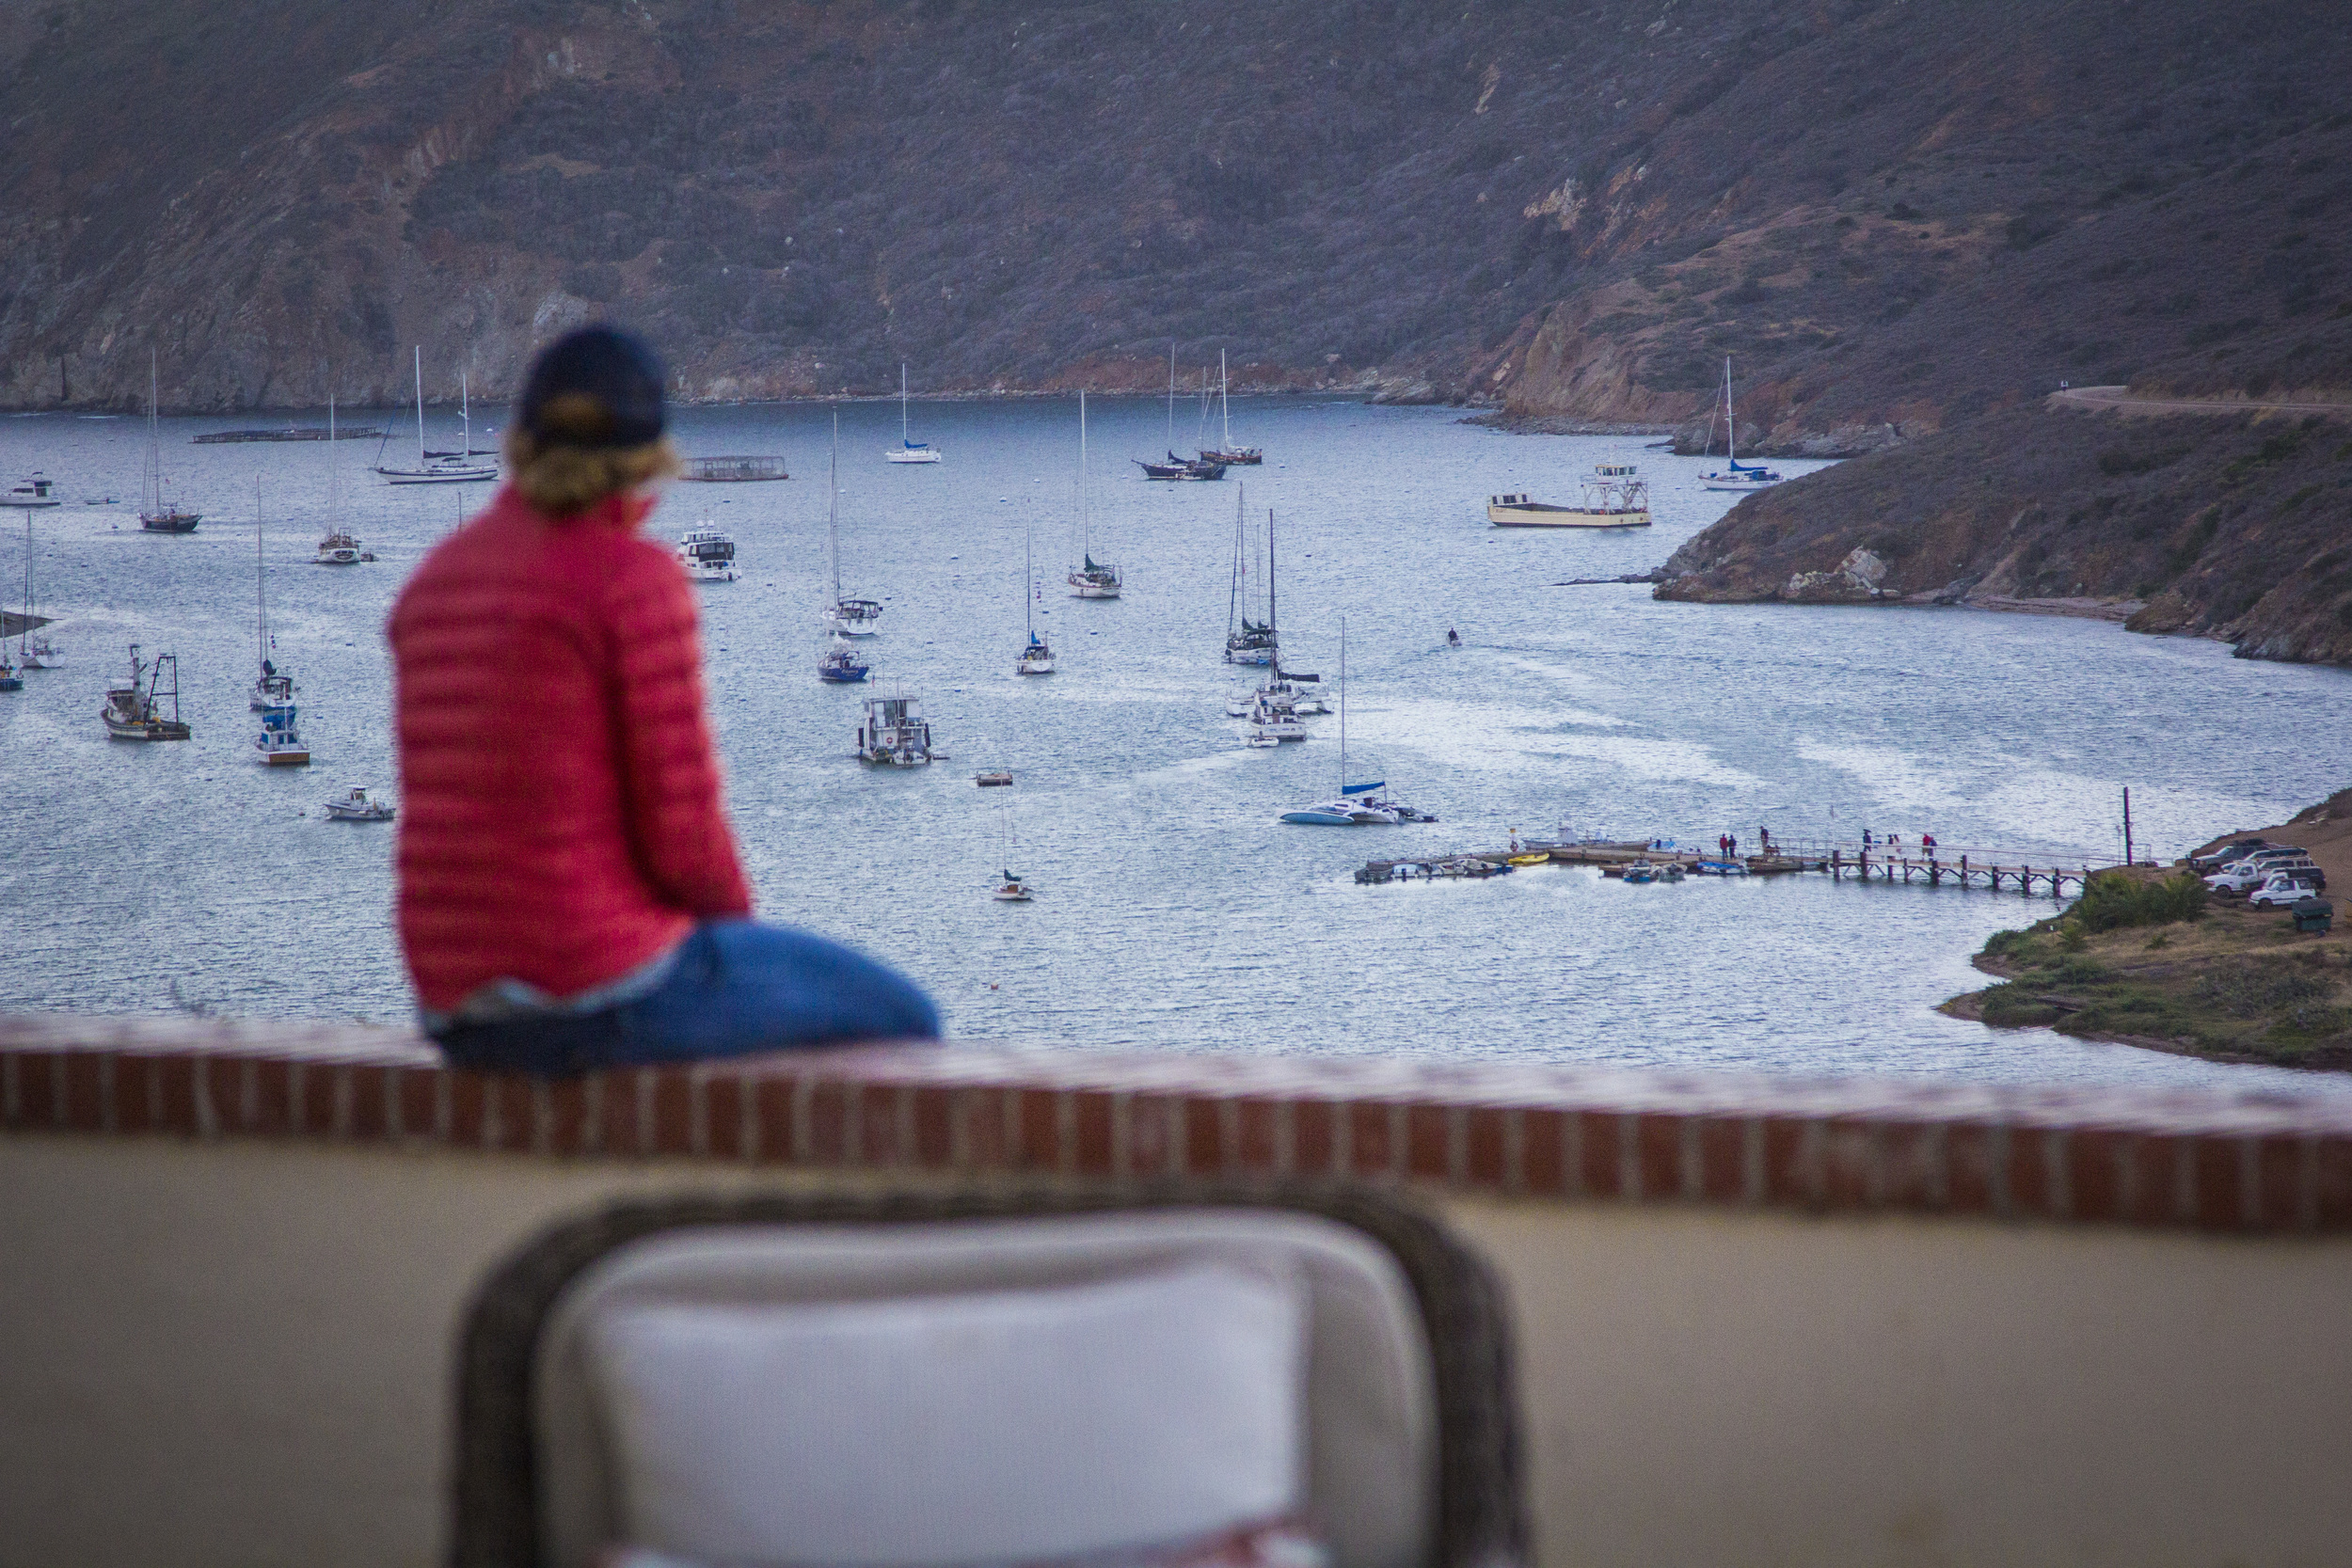 Overlooking Isthmus Bay. Photo Credit: Michael Auffant